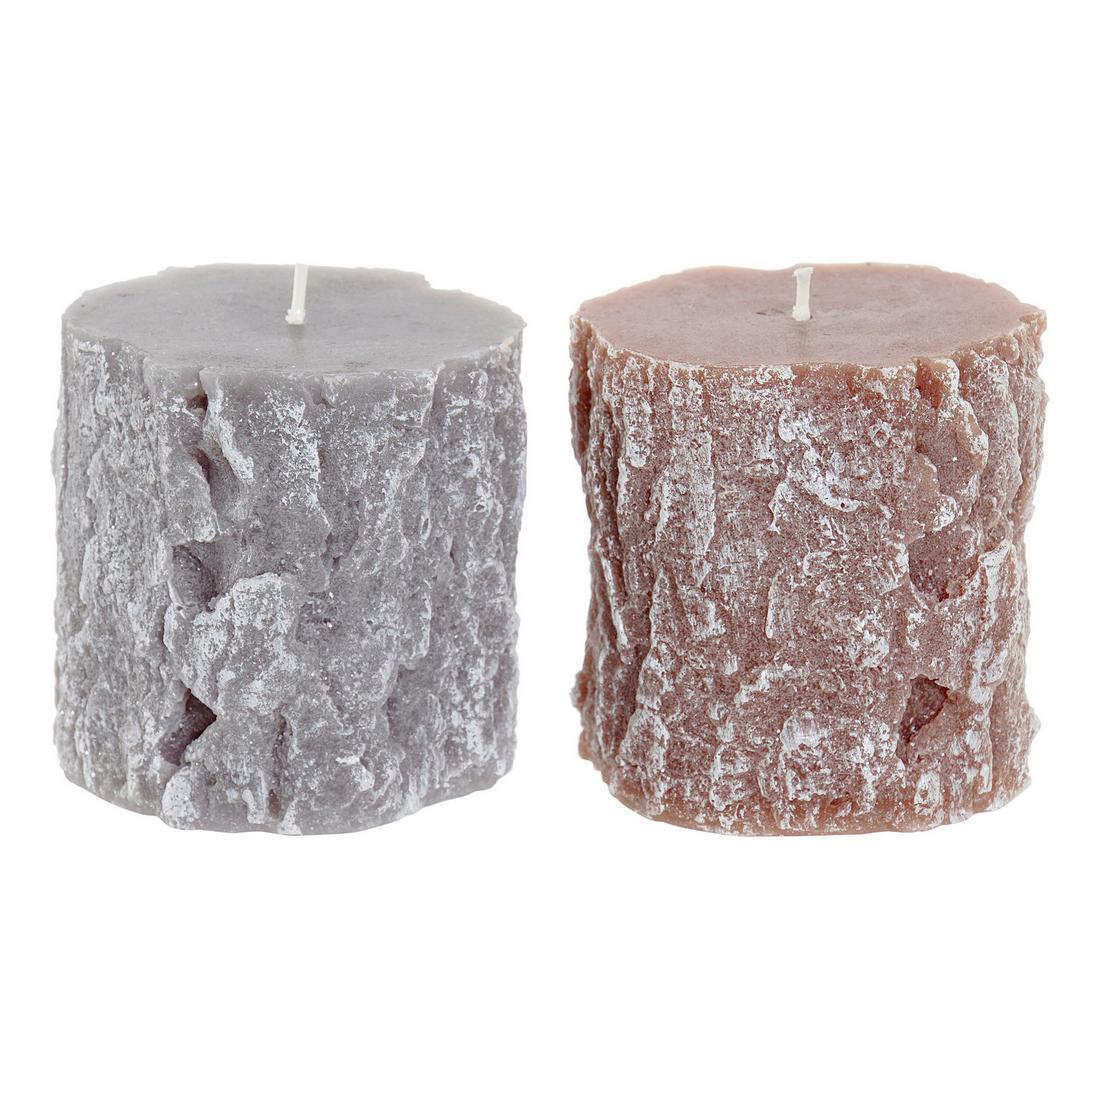 Candle DKD Home Decor (2 pcs)